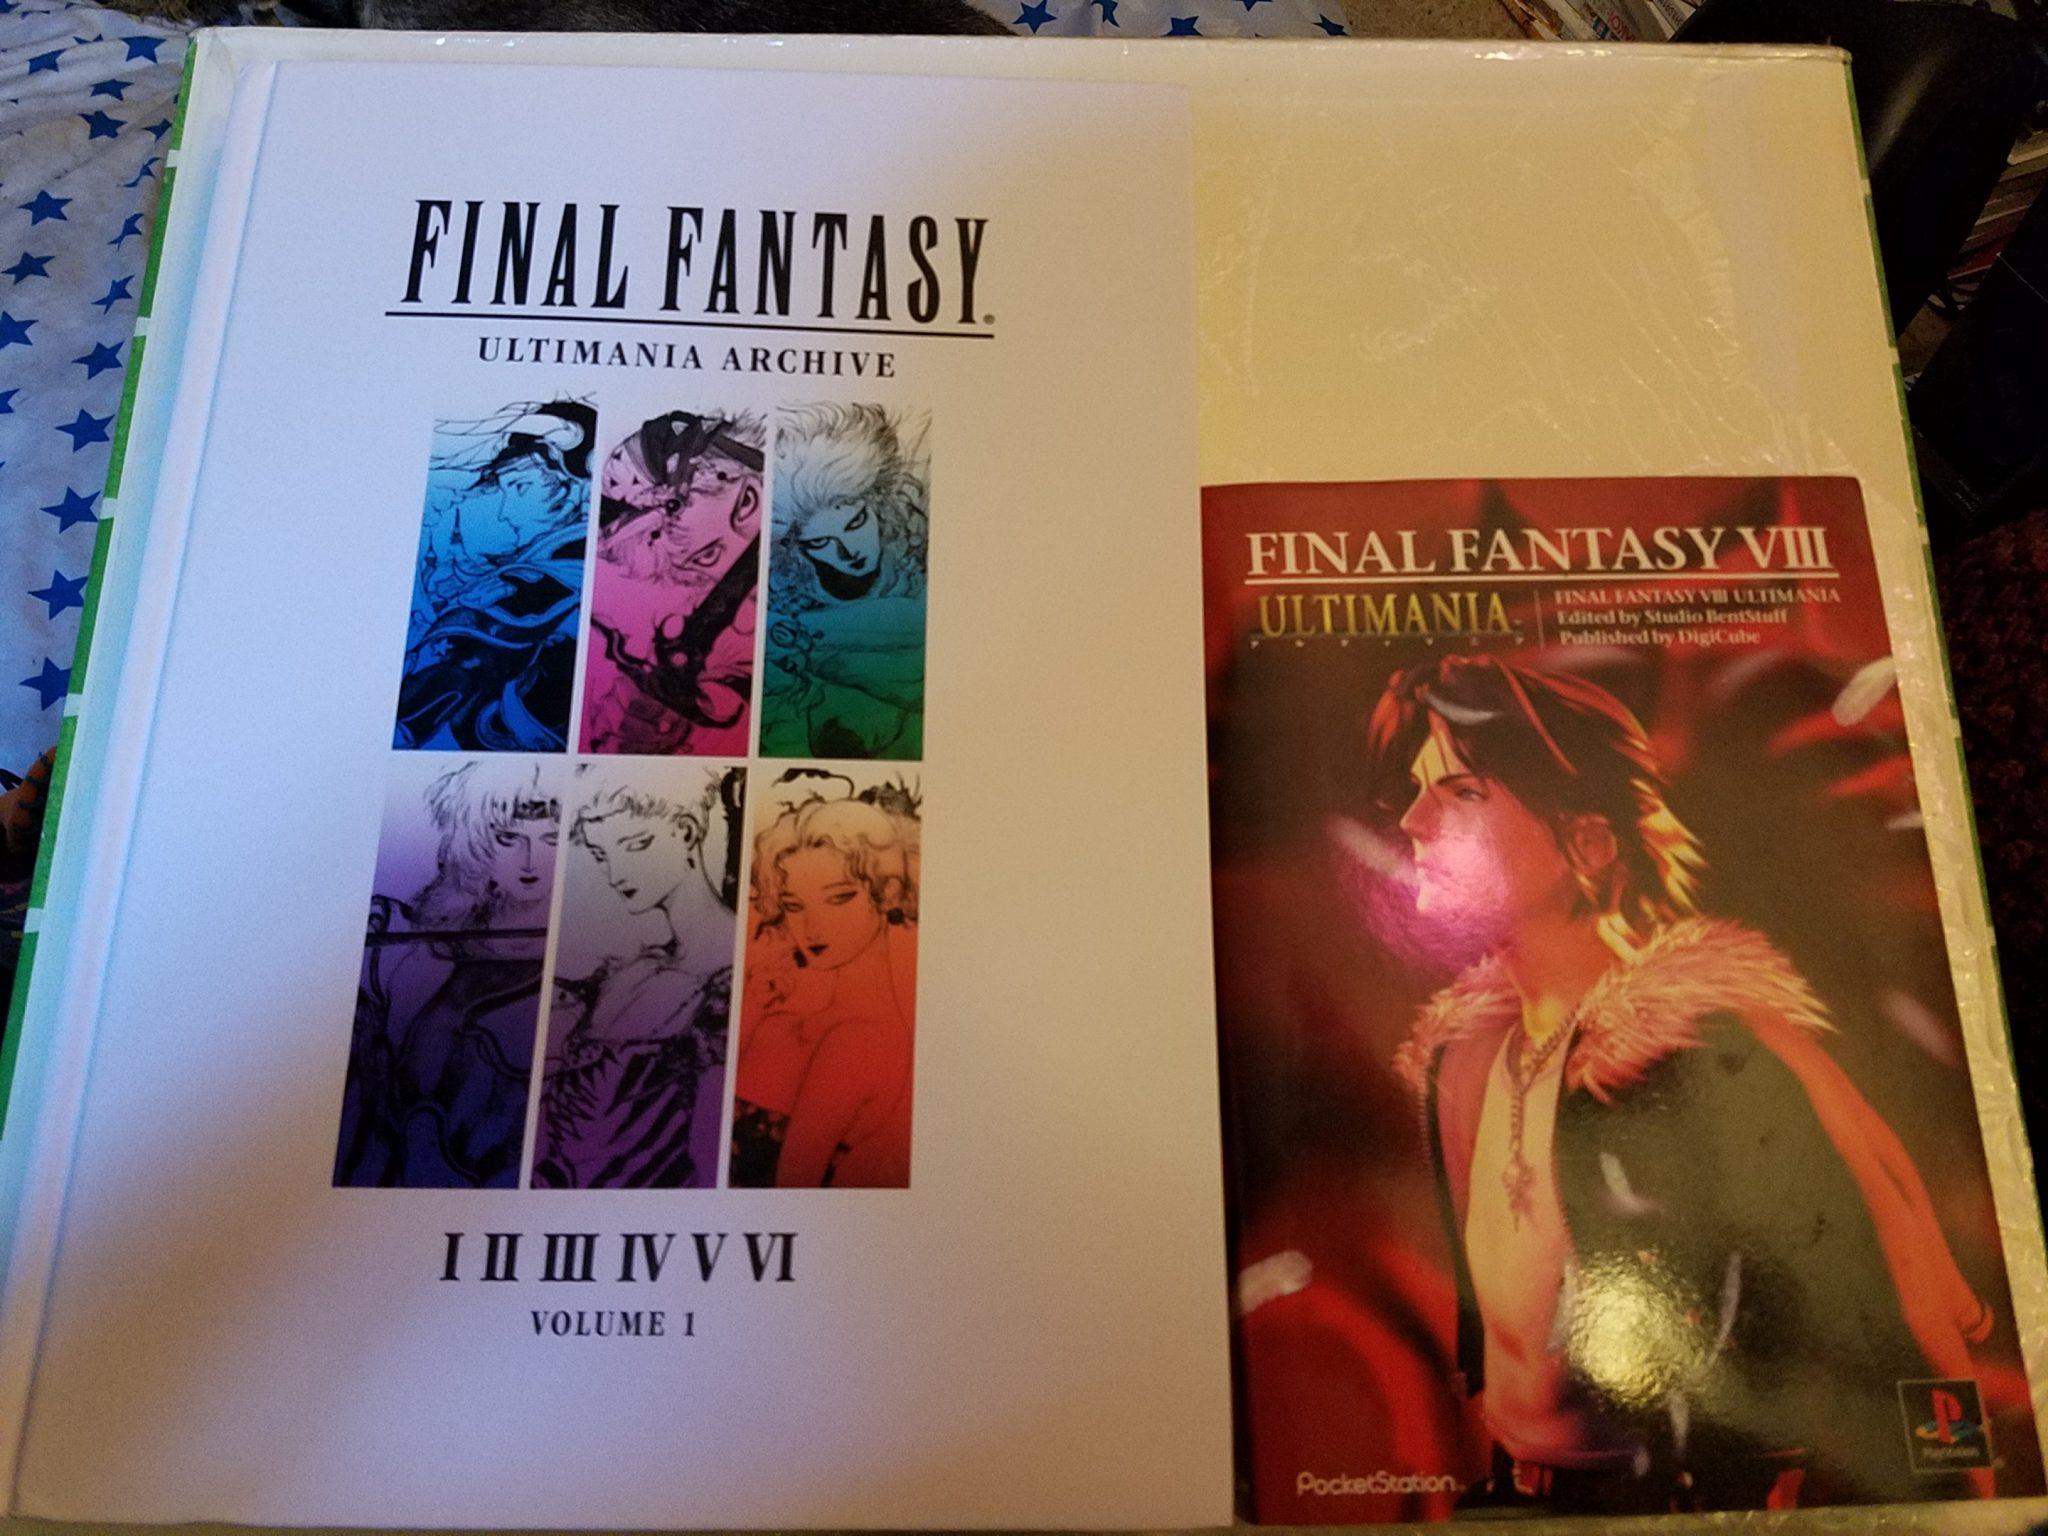 Final Fantasy Ultimania Archive 1 vs VII Ultimania